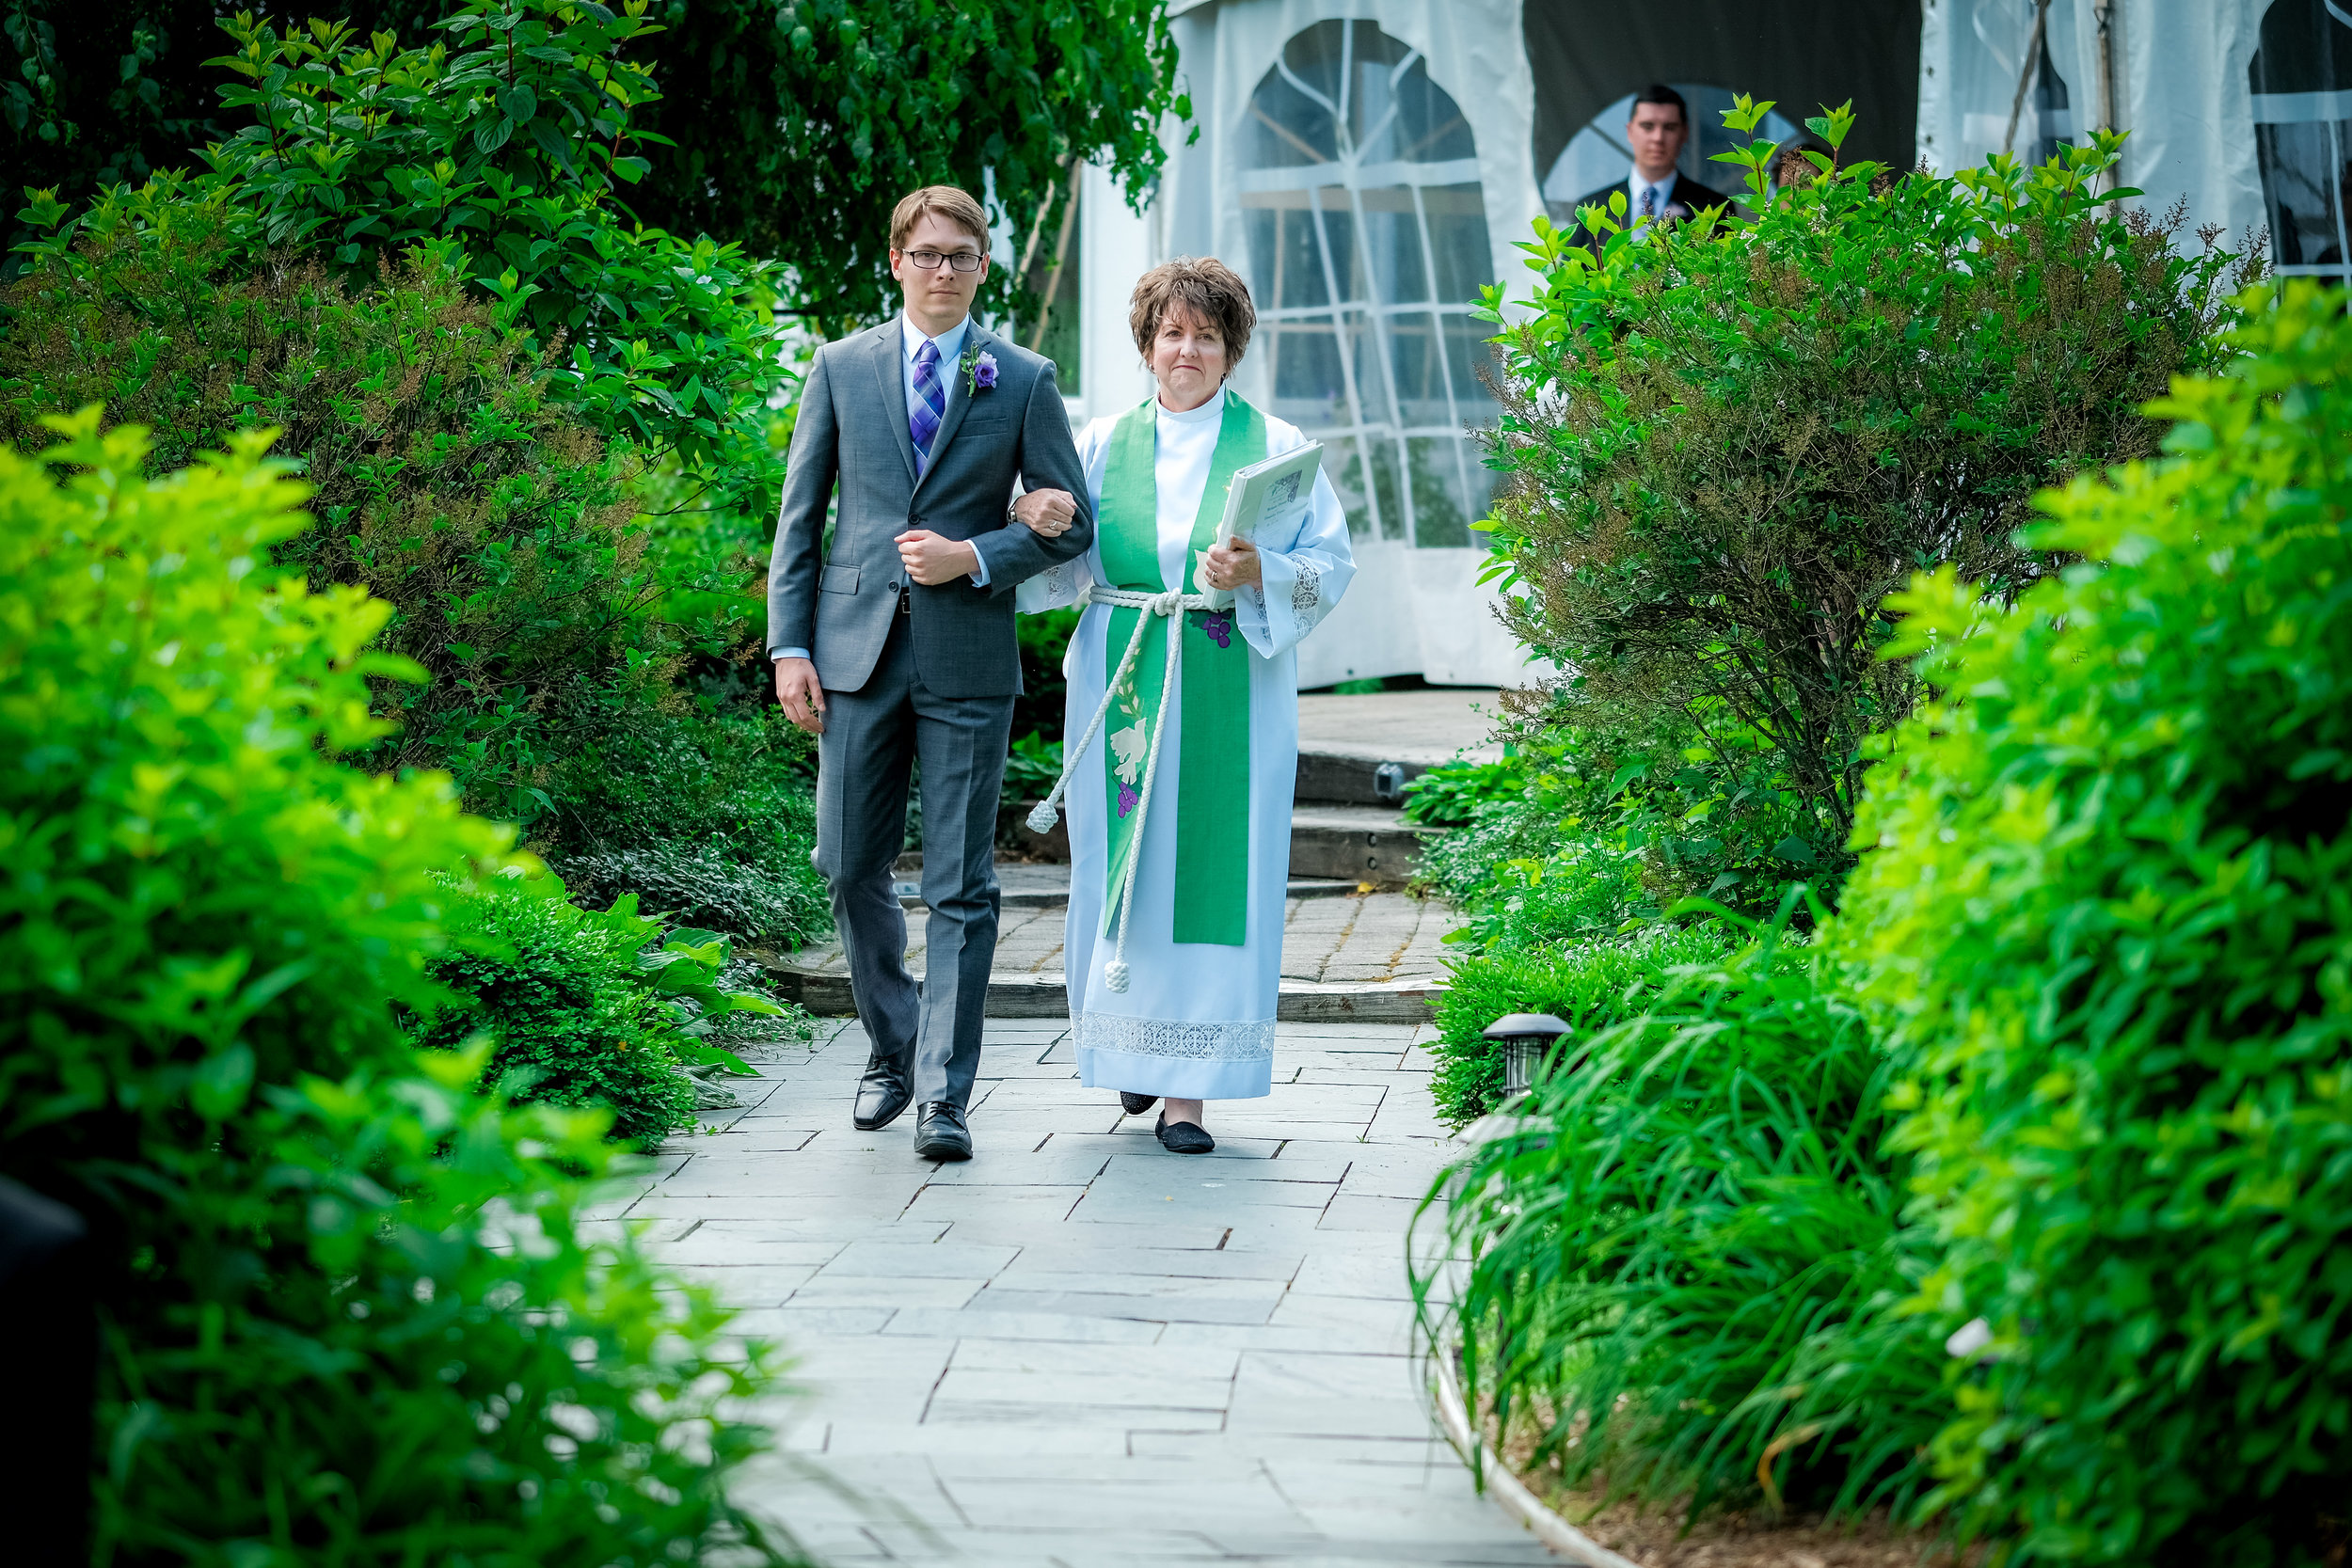 Vermont-Lilac-Inn-Wedding-Photography-490.jpg